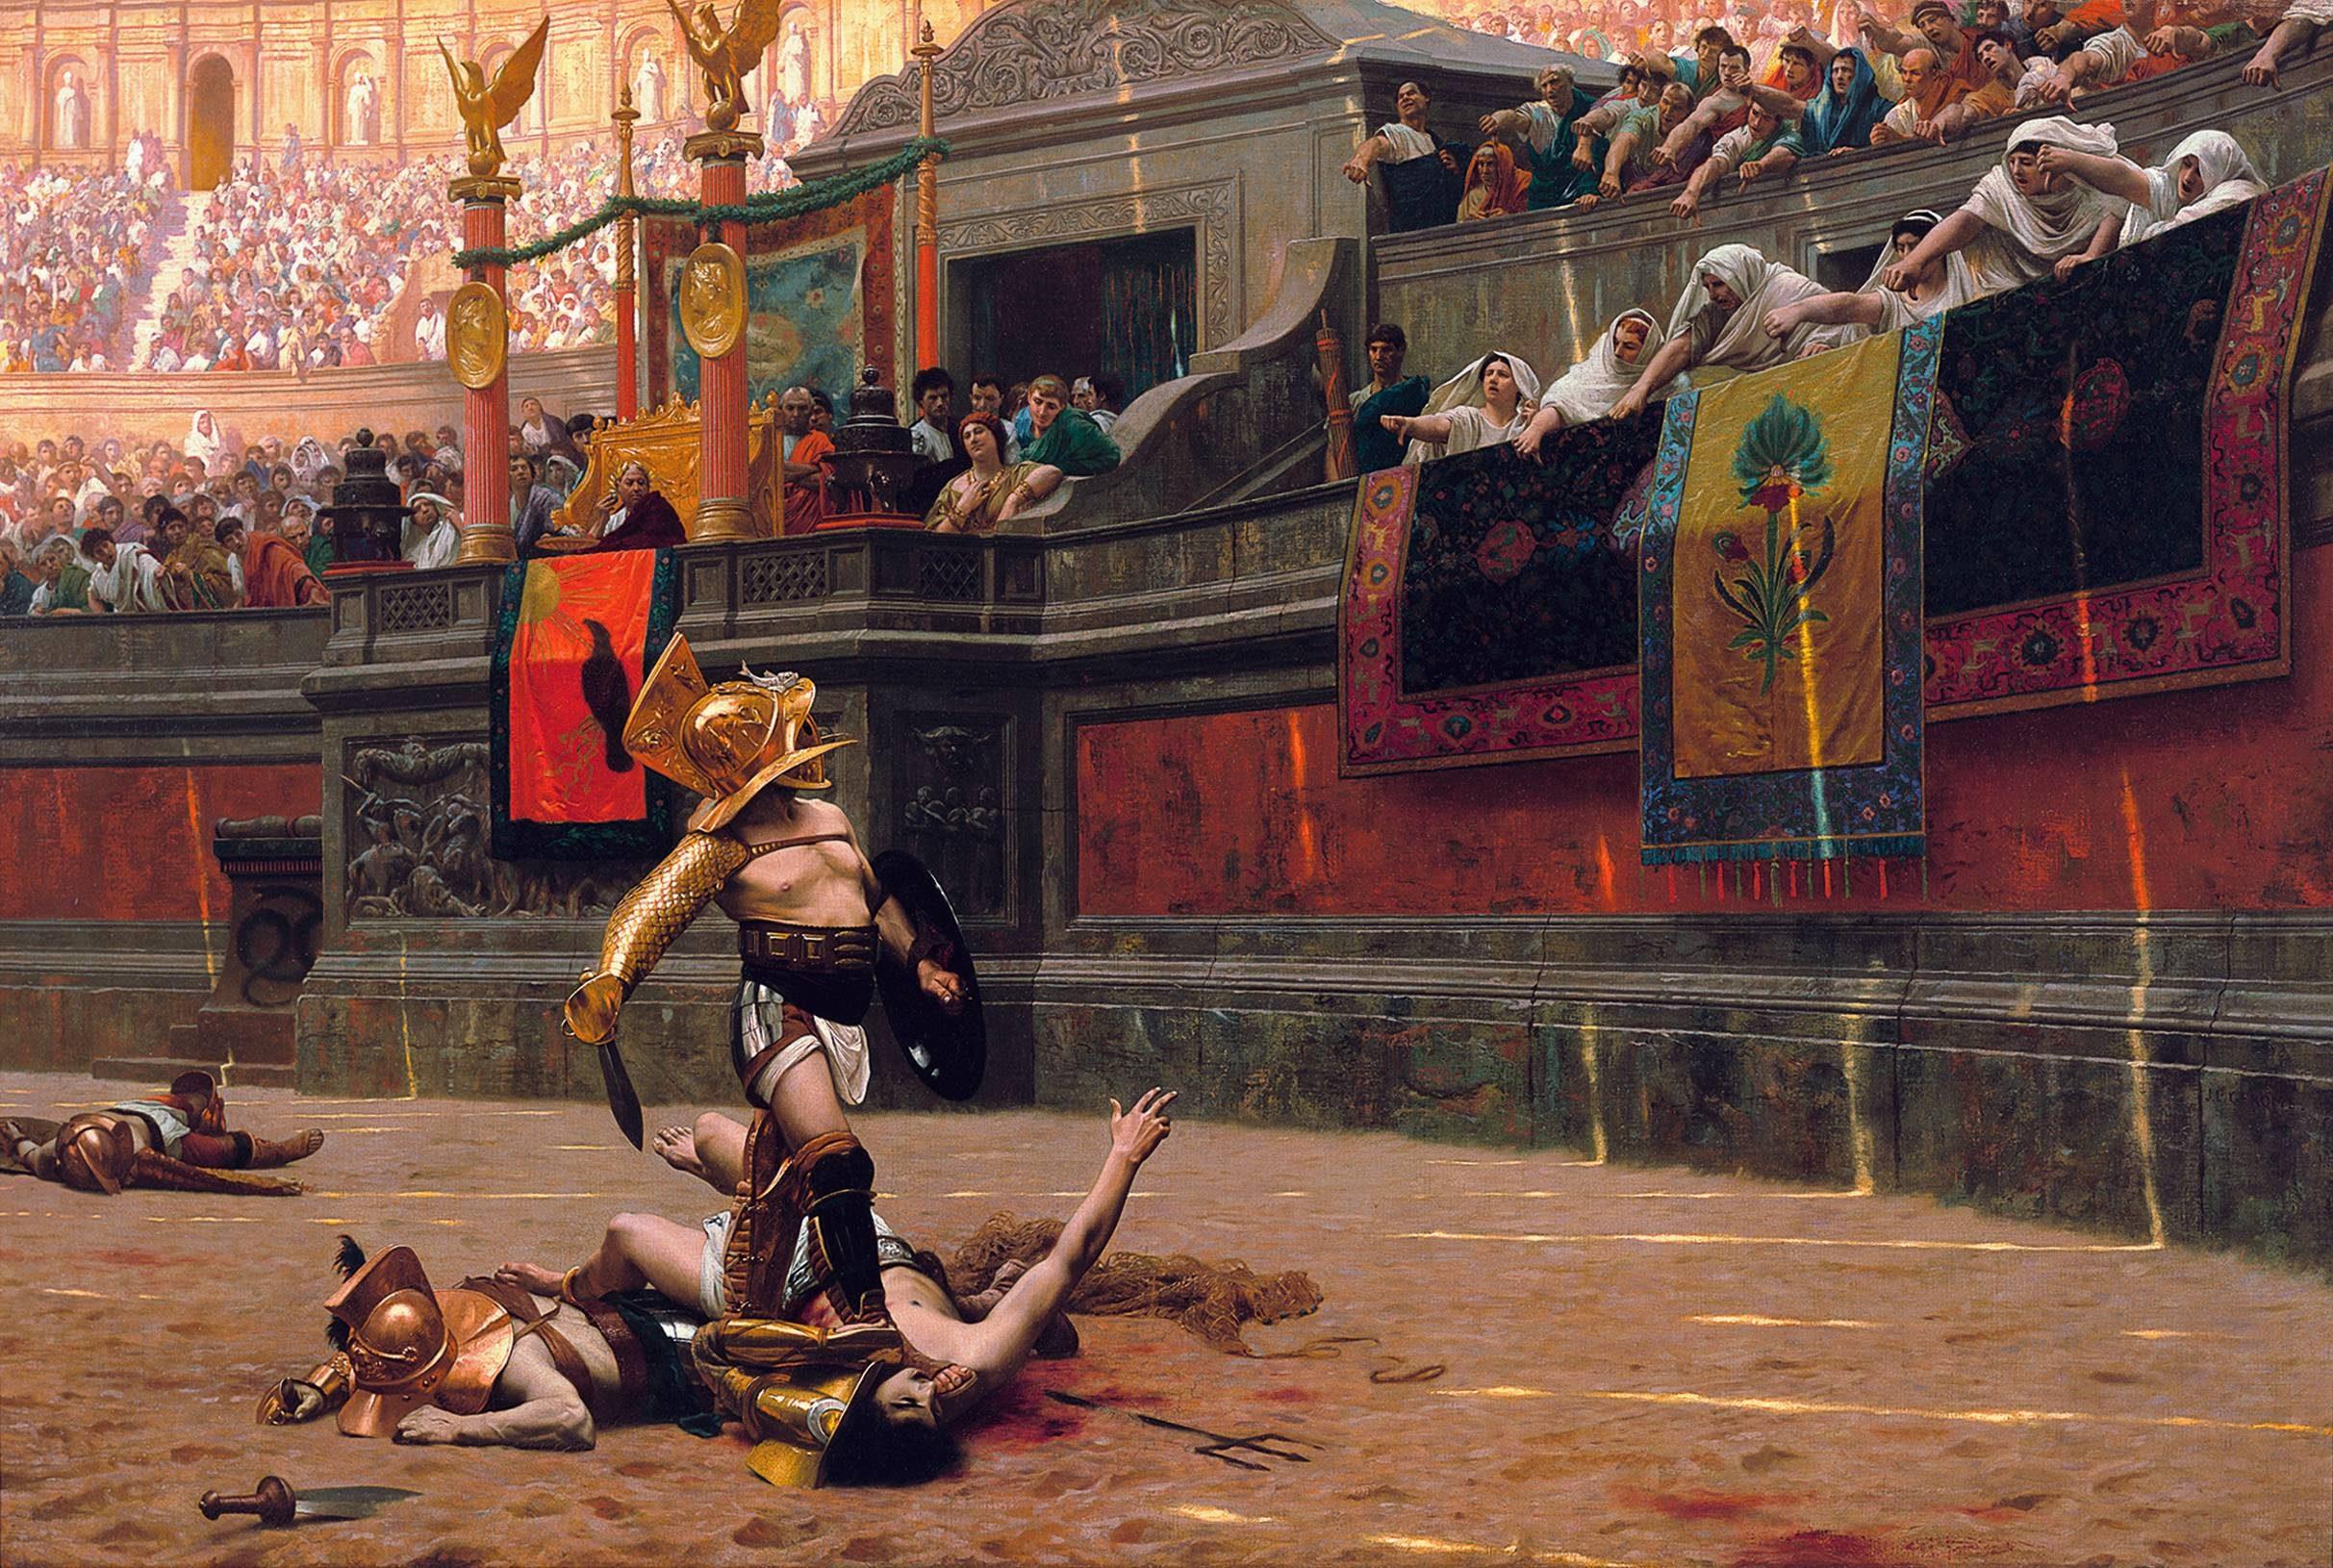 combat de gladiateurs Rome